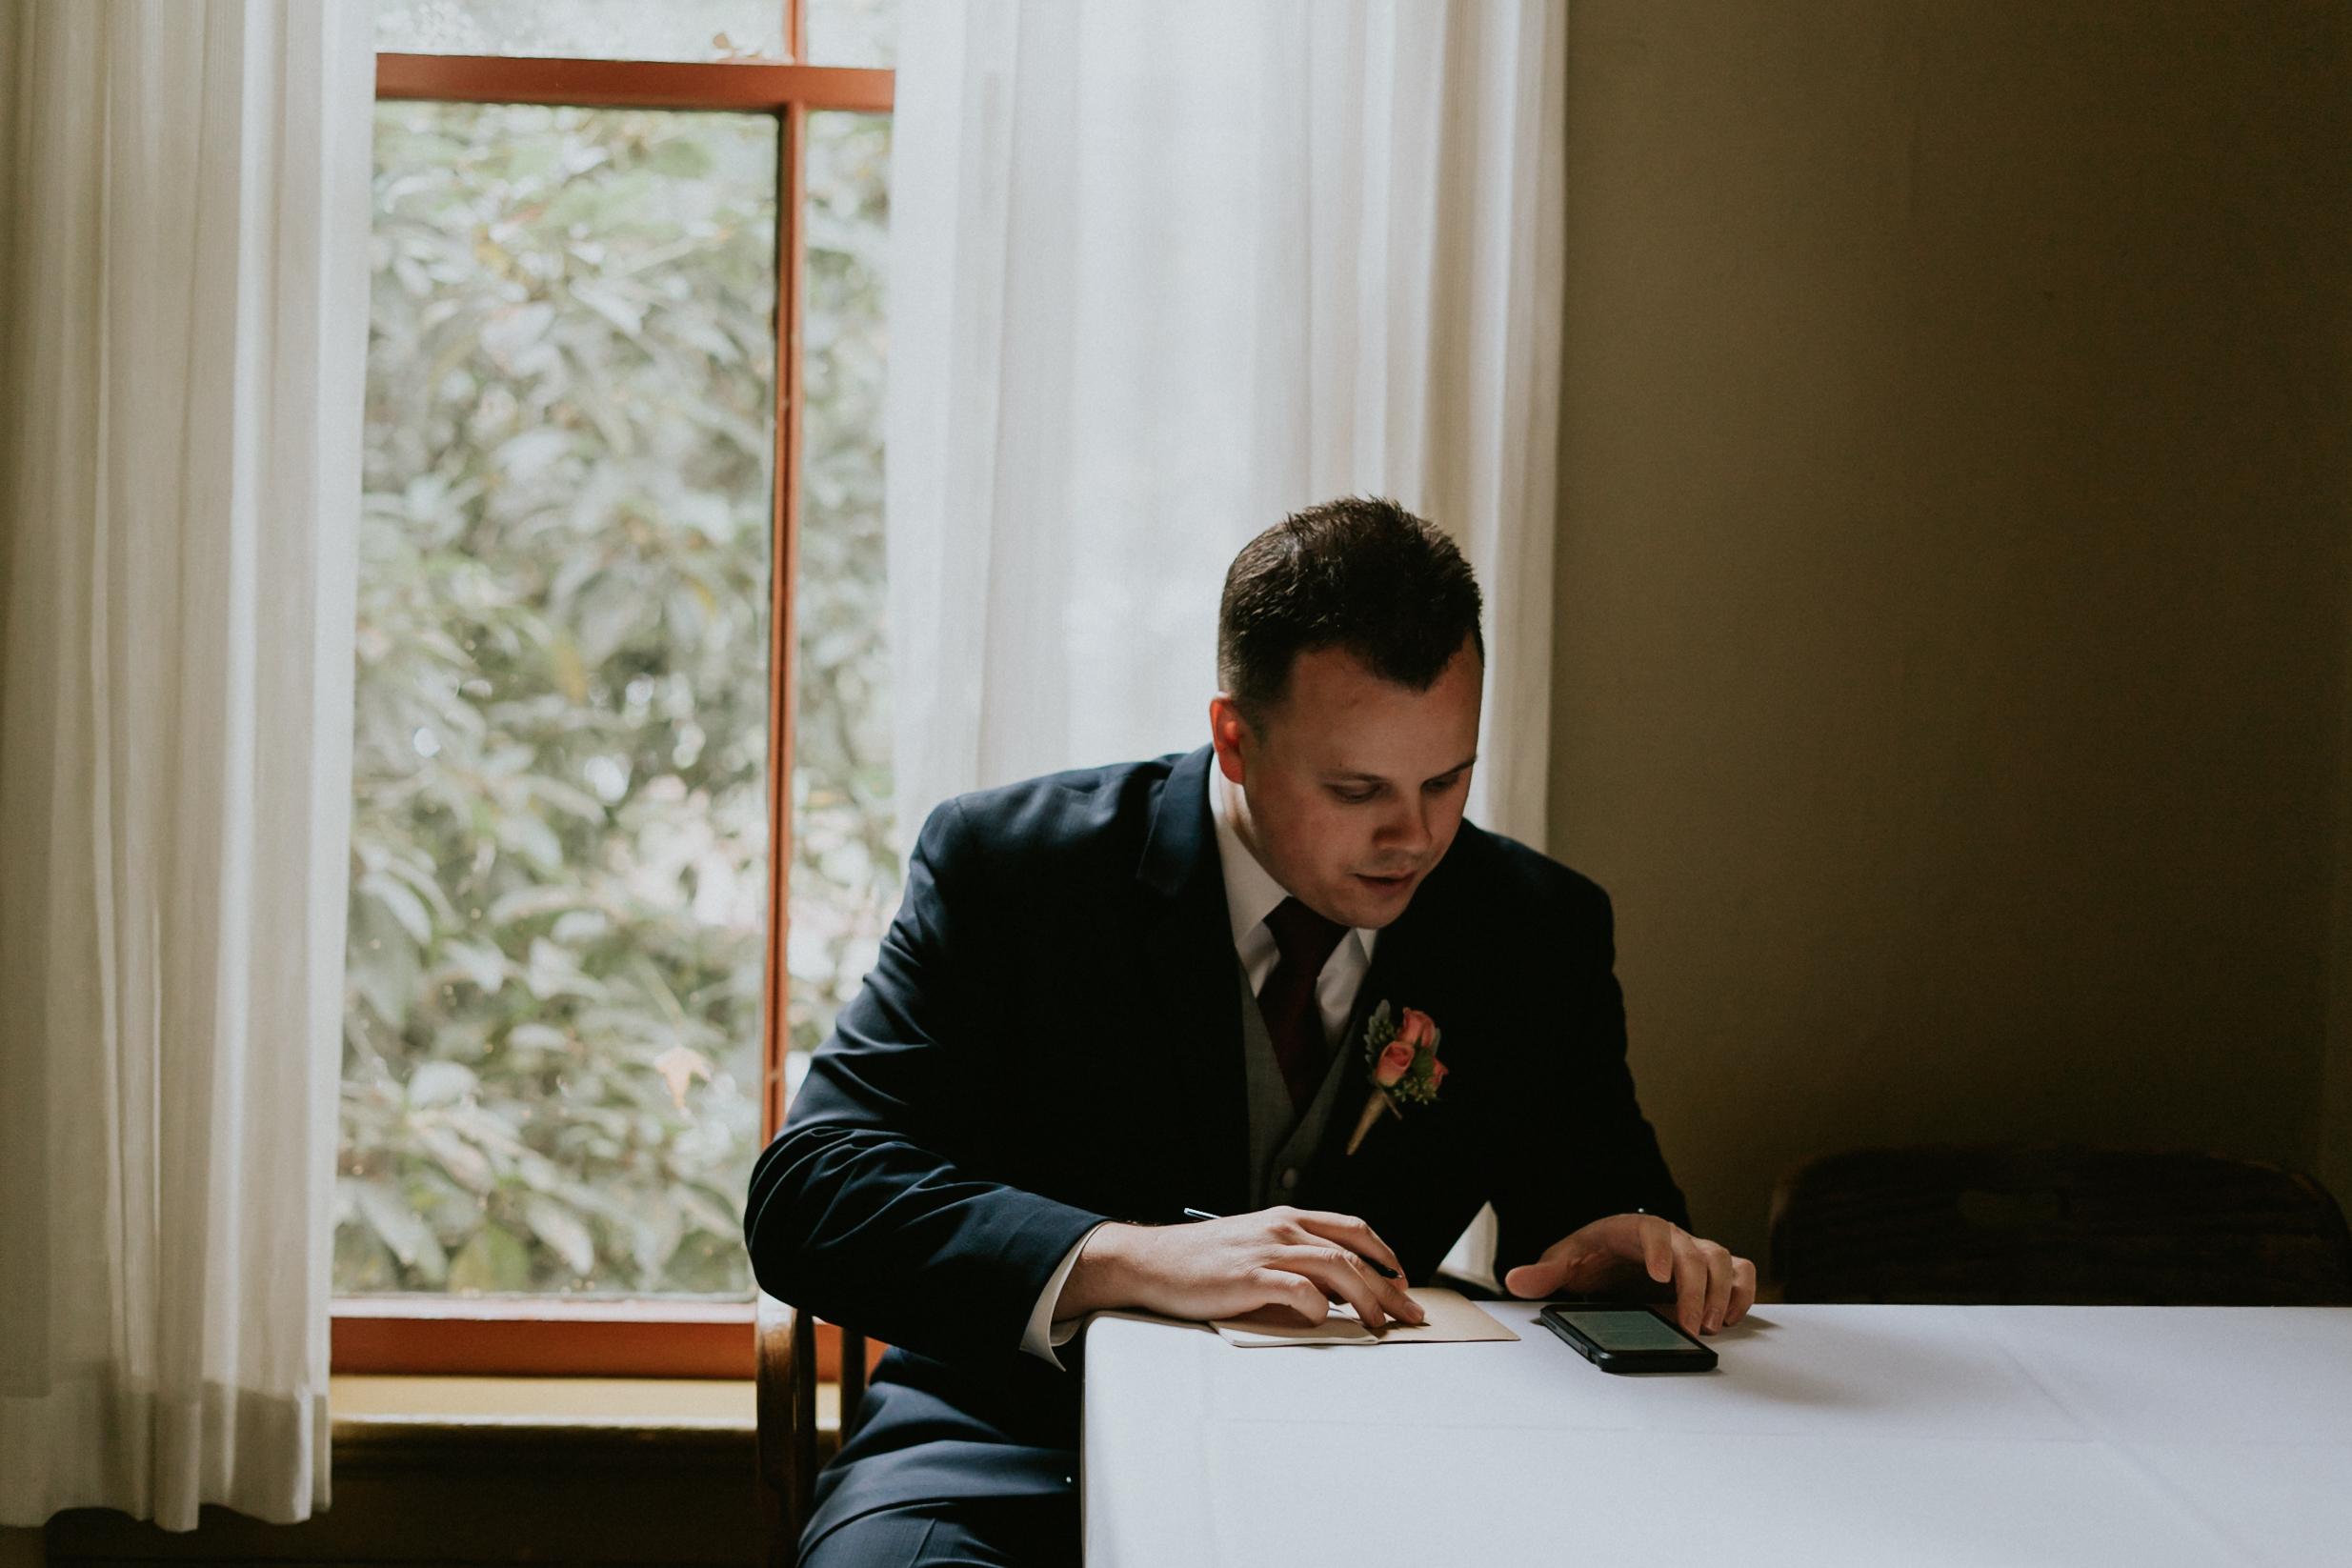 Portland_wedding_photographer_McMenamins_Alfred_Tang-22.jpg